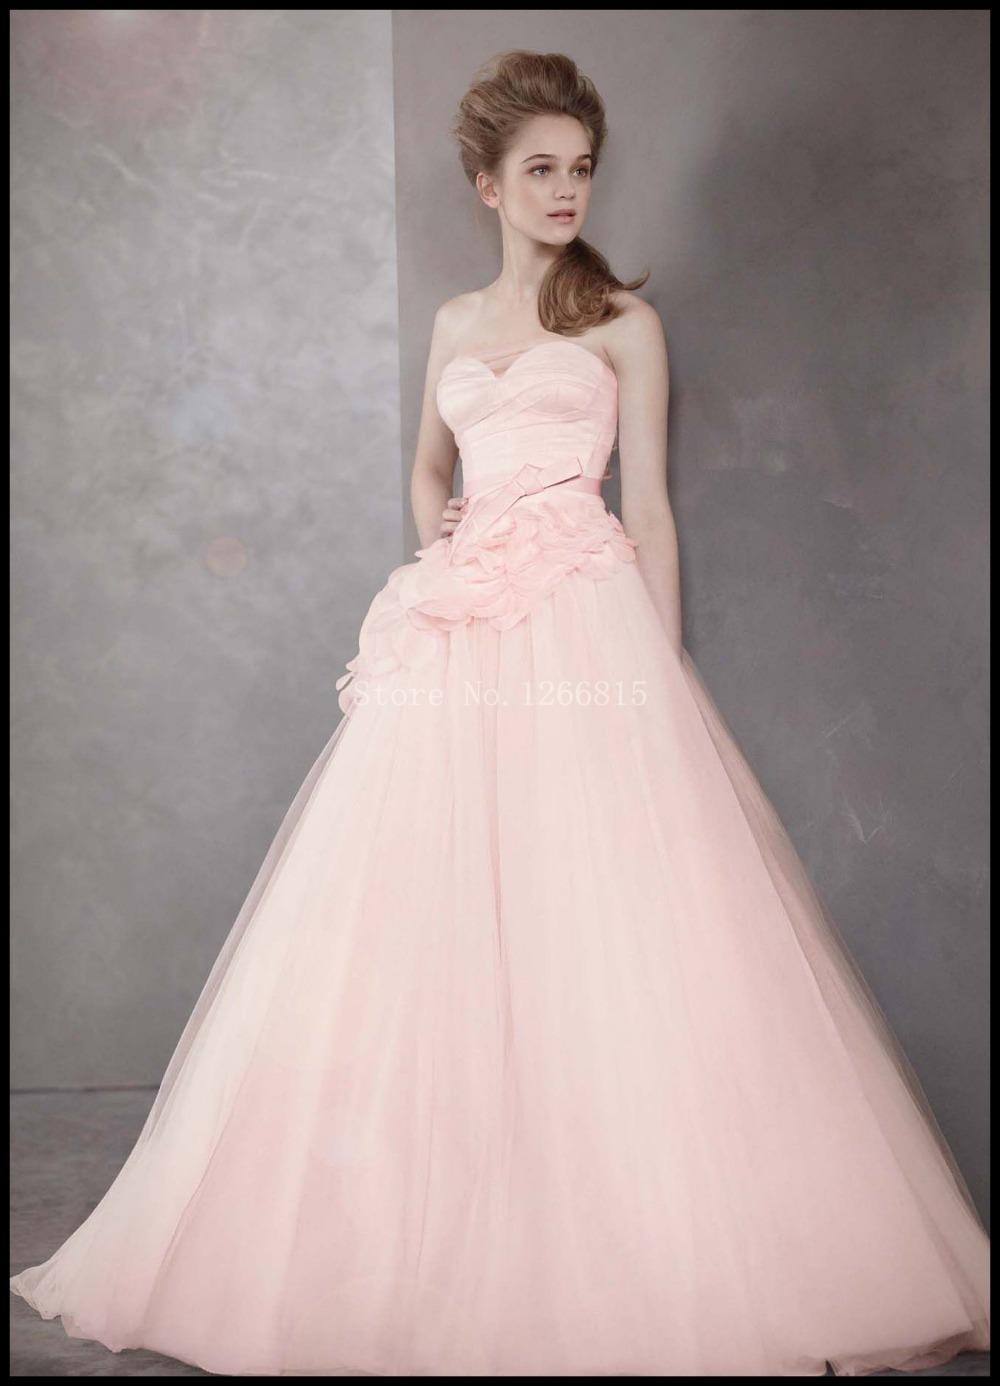 Modern Wedding Dresses Backless : Pink ball gown wedding dresses sweetheart backless bridal gowns z